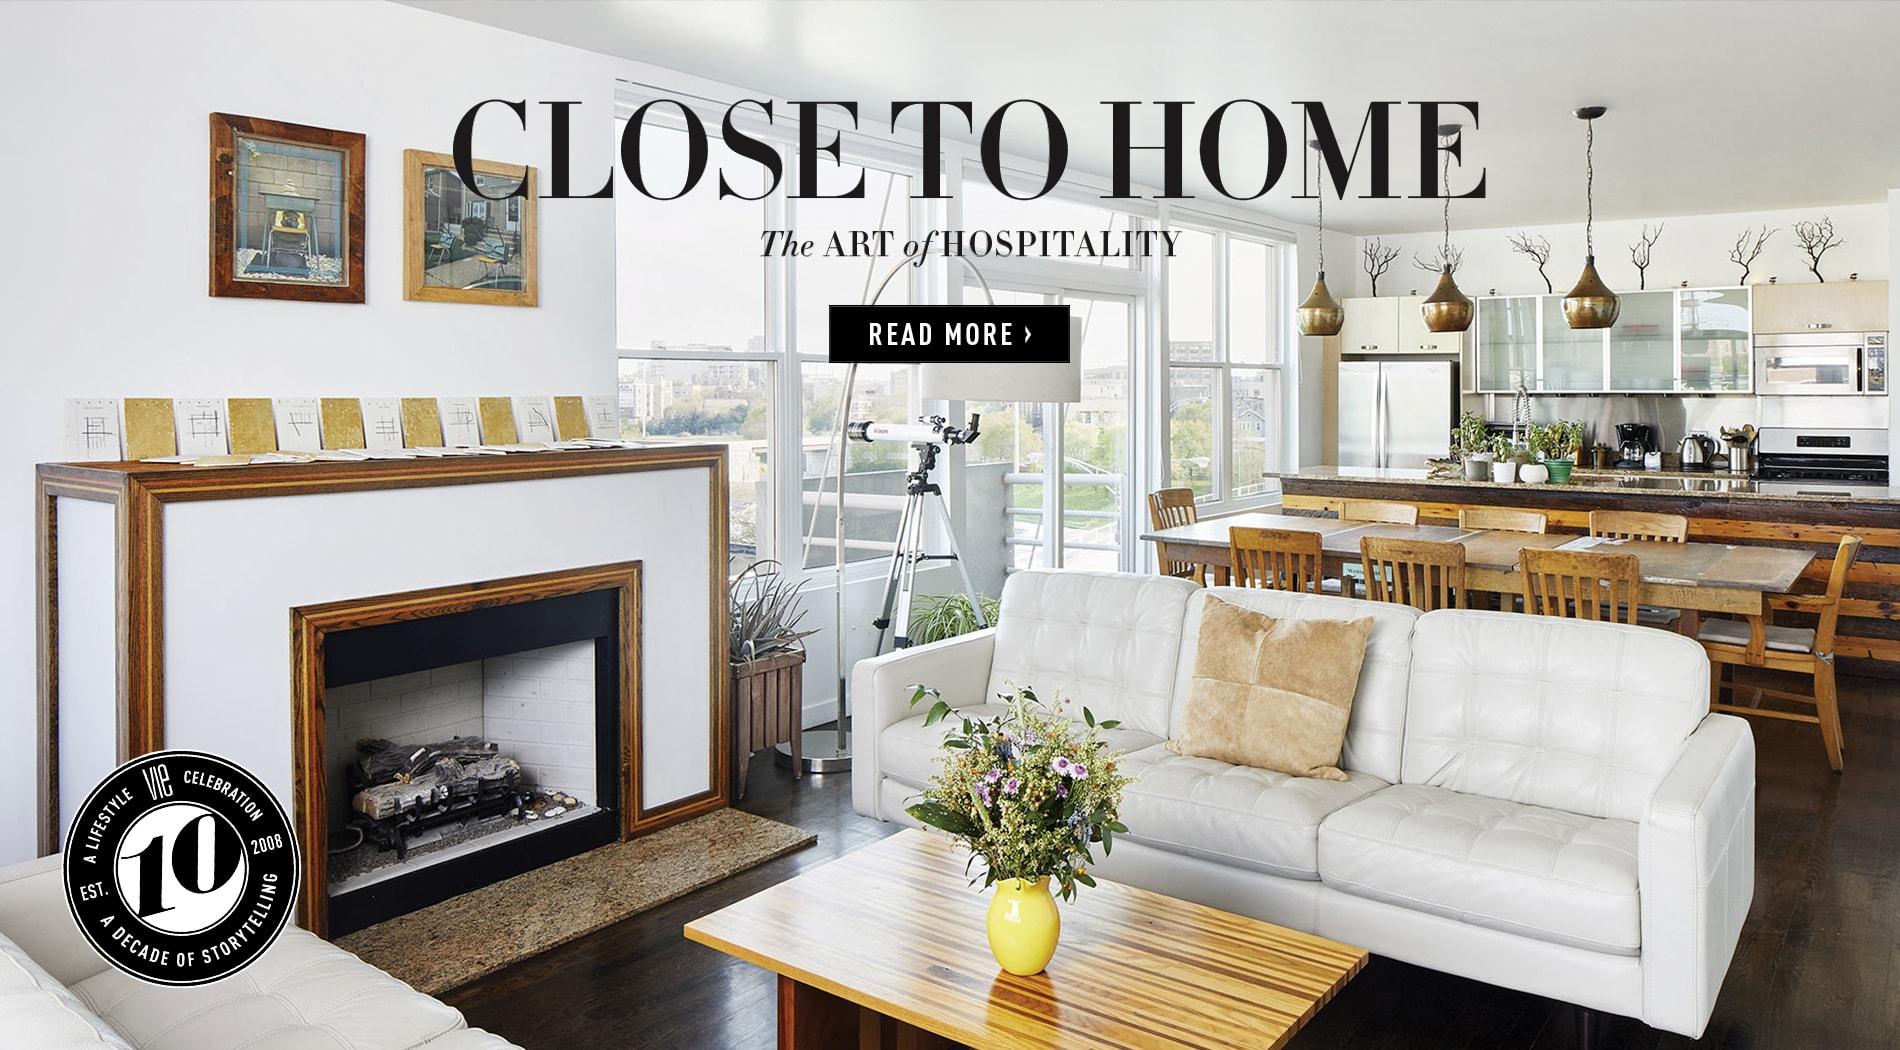 VIE Magazine - July 2018 Architecture & Design Issue - Close to Home